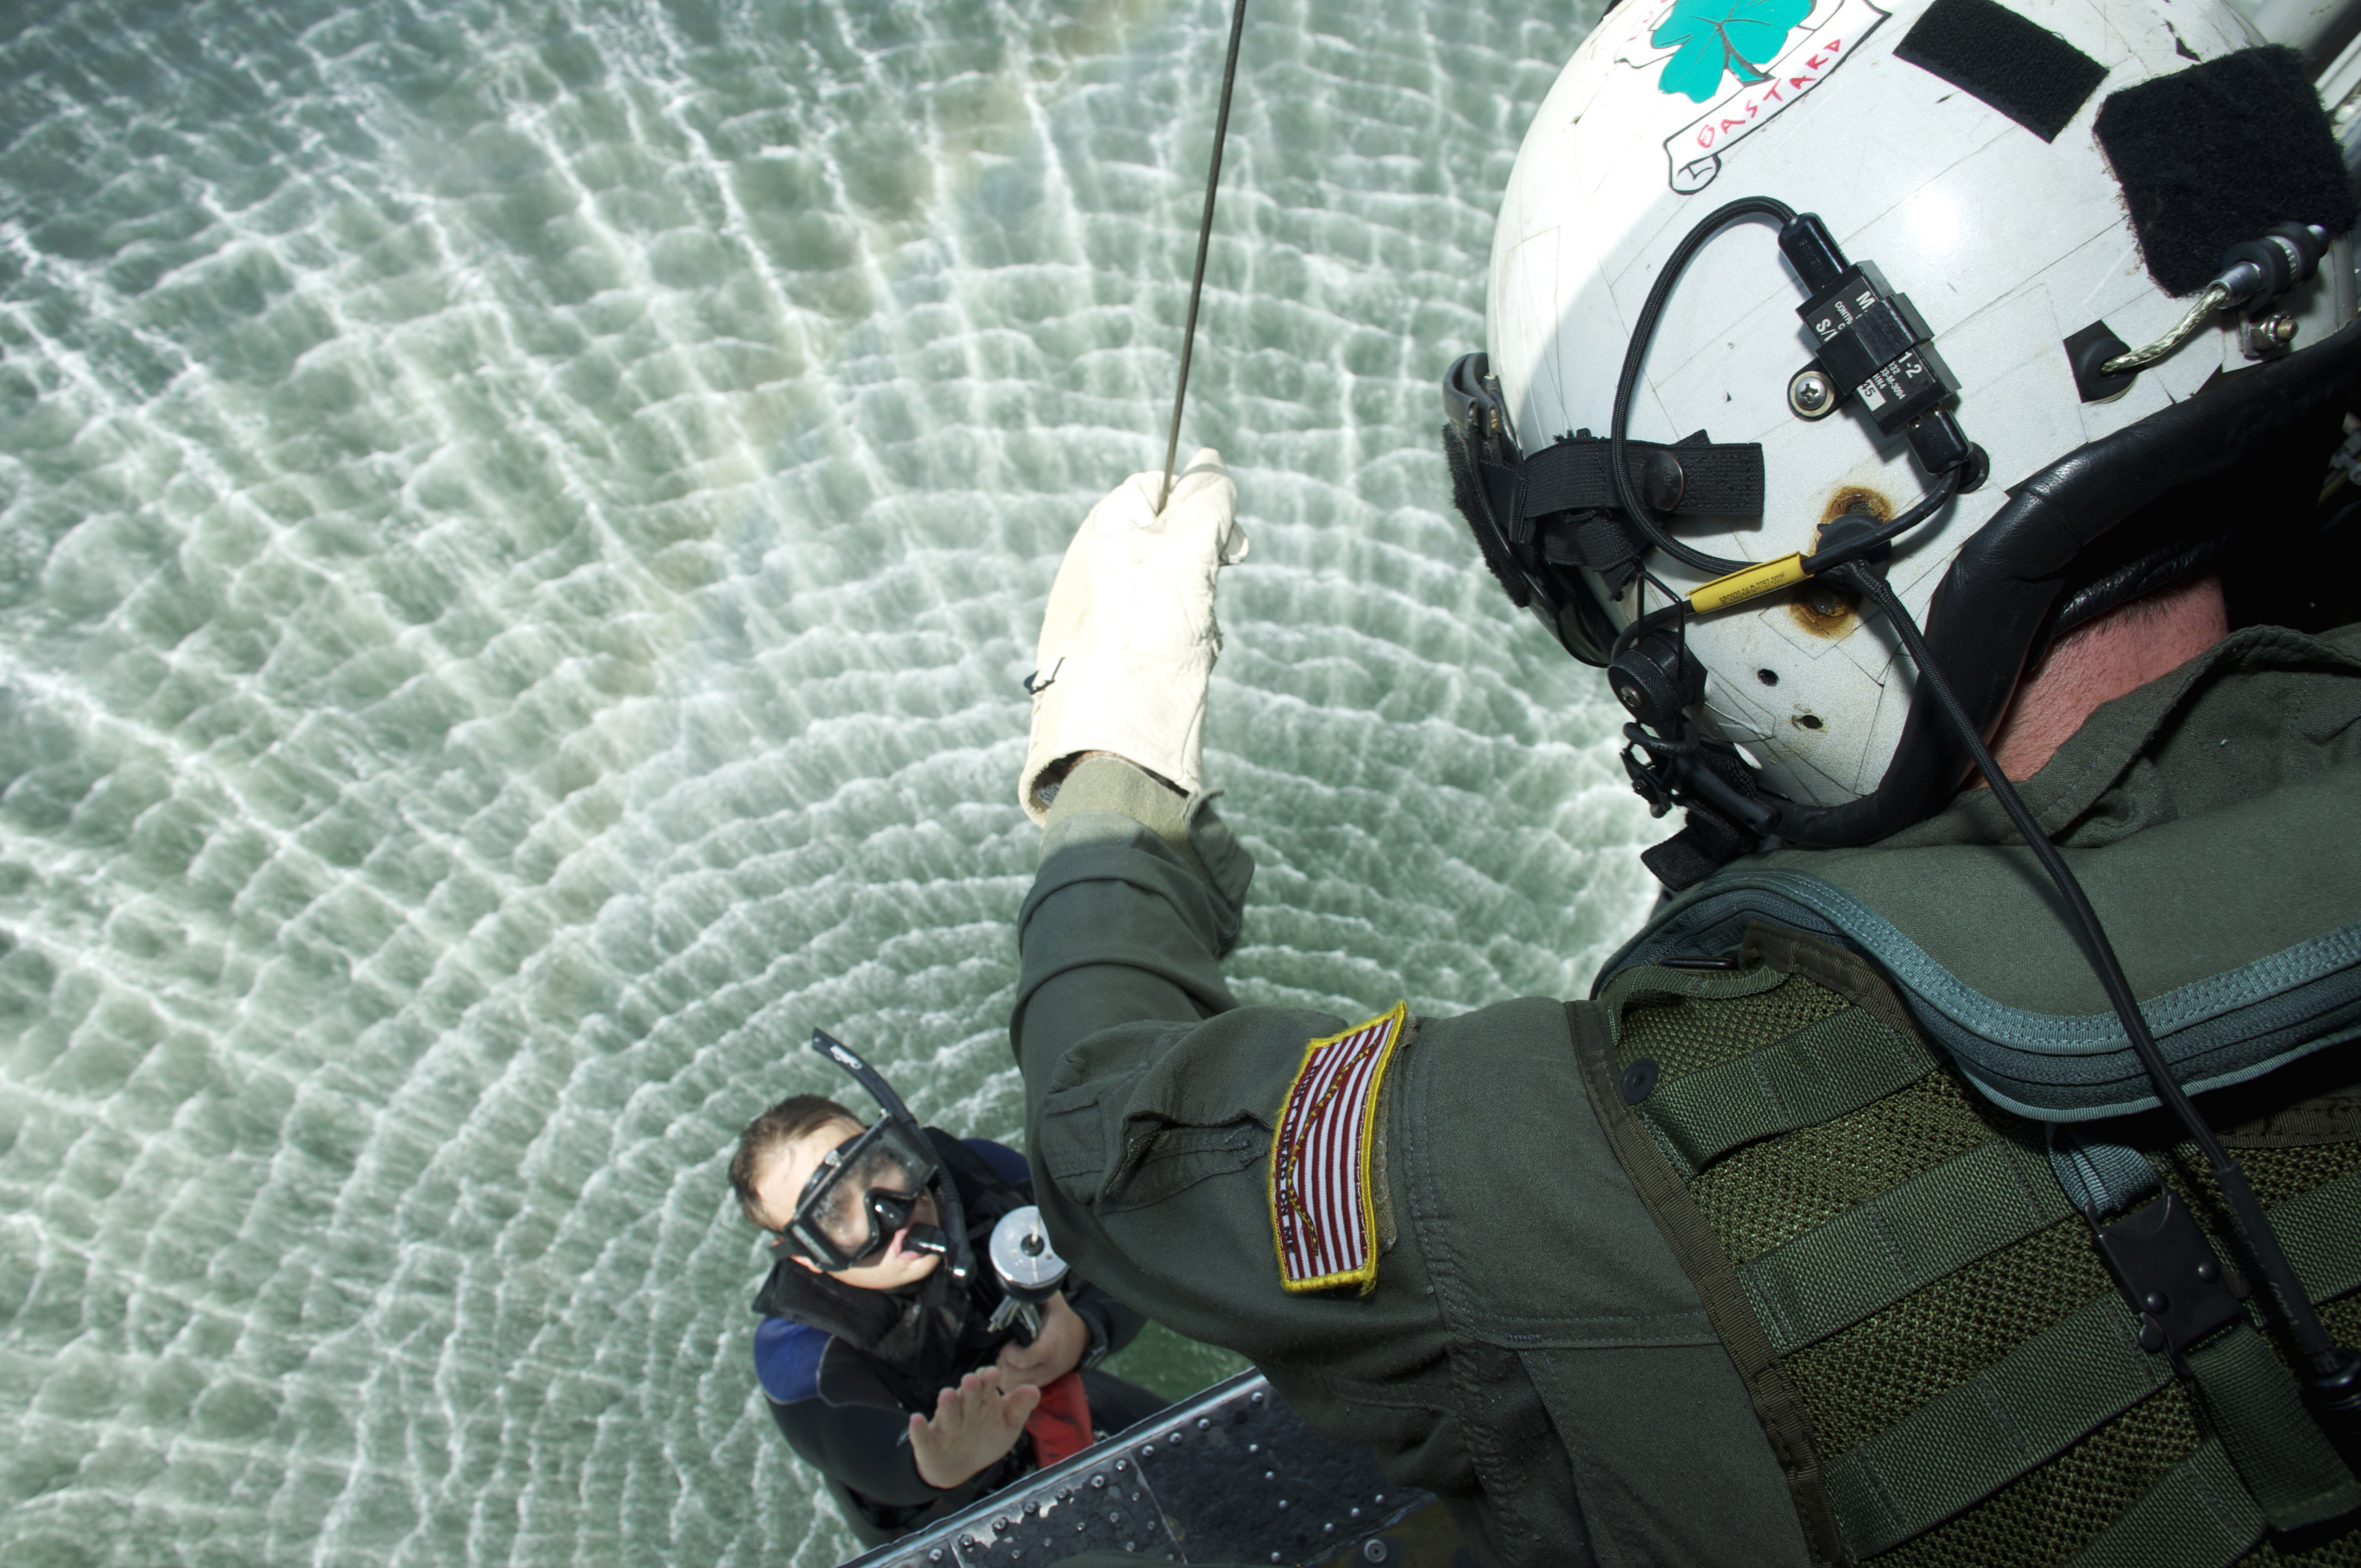 File:US Navy 090819-N-4134D-698 Naval Air Crewman 2nd Class John ...